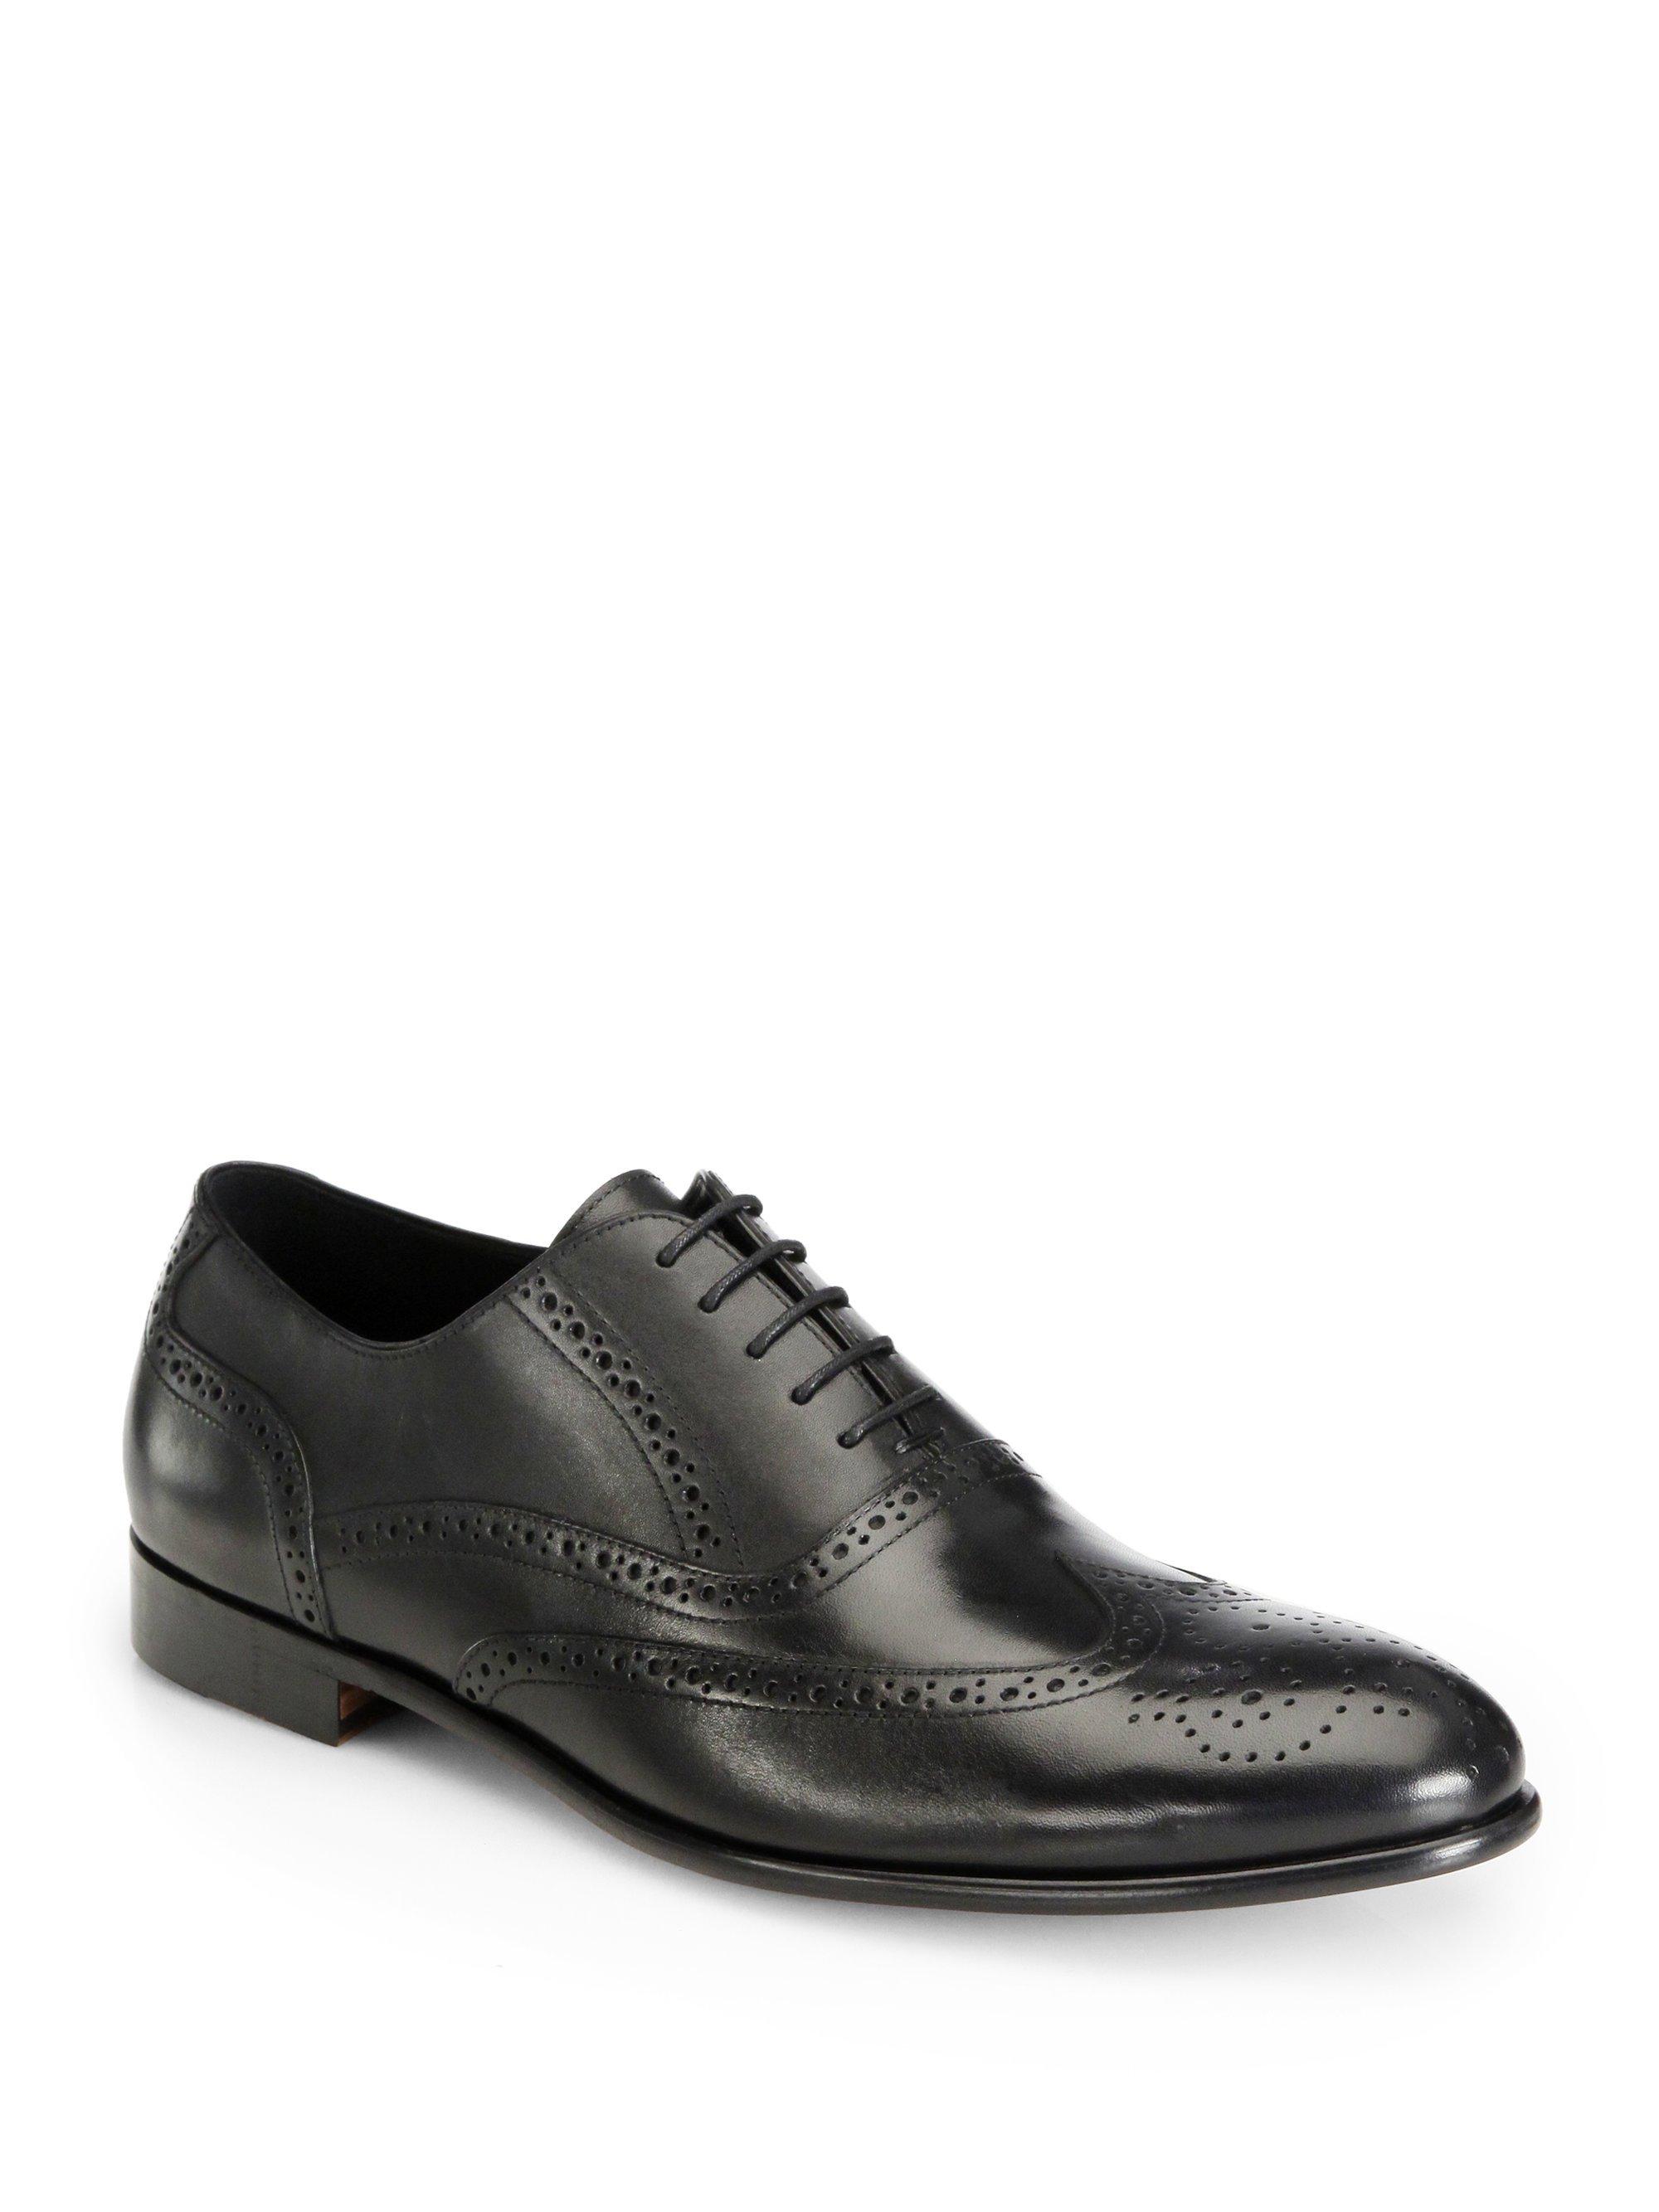 gordon pacific wingtip oxford dress shoe in black for